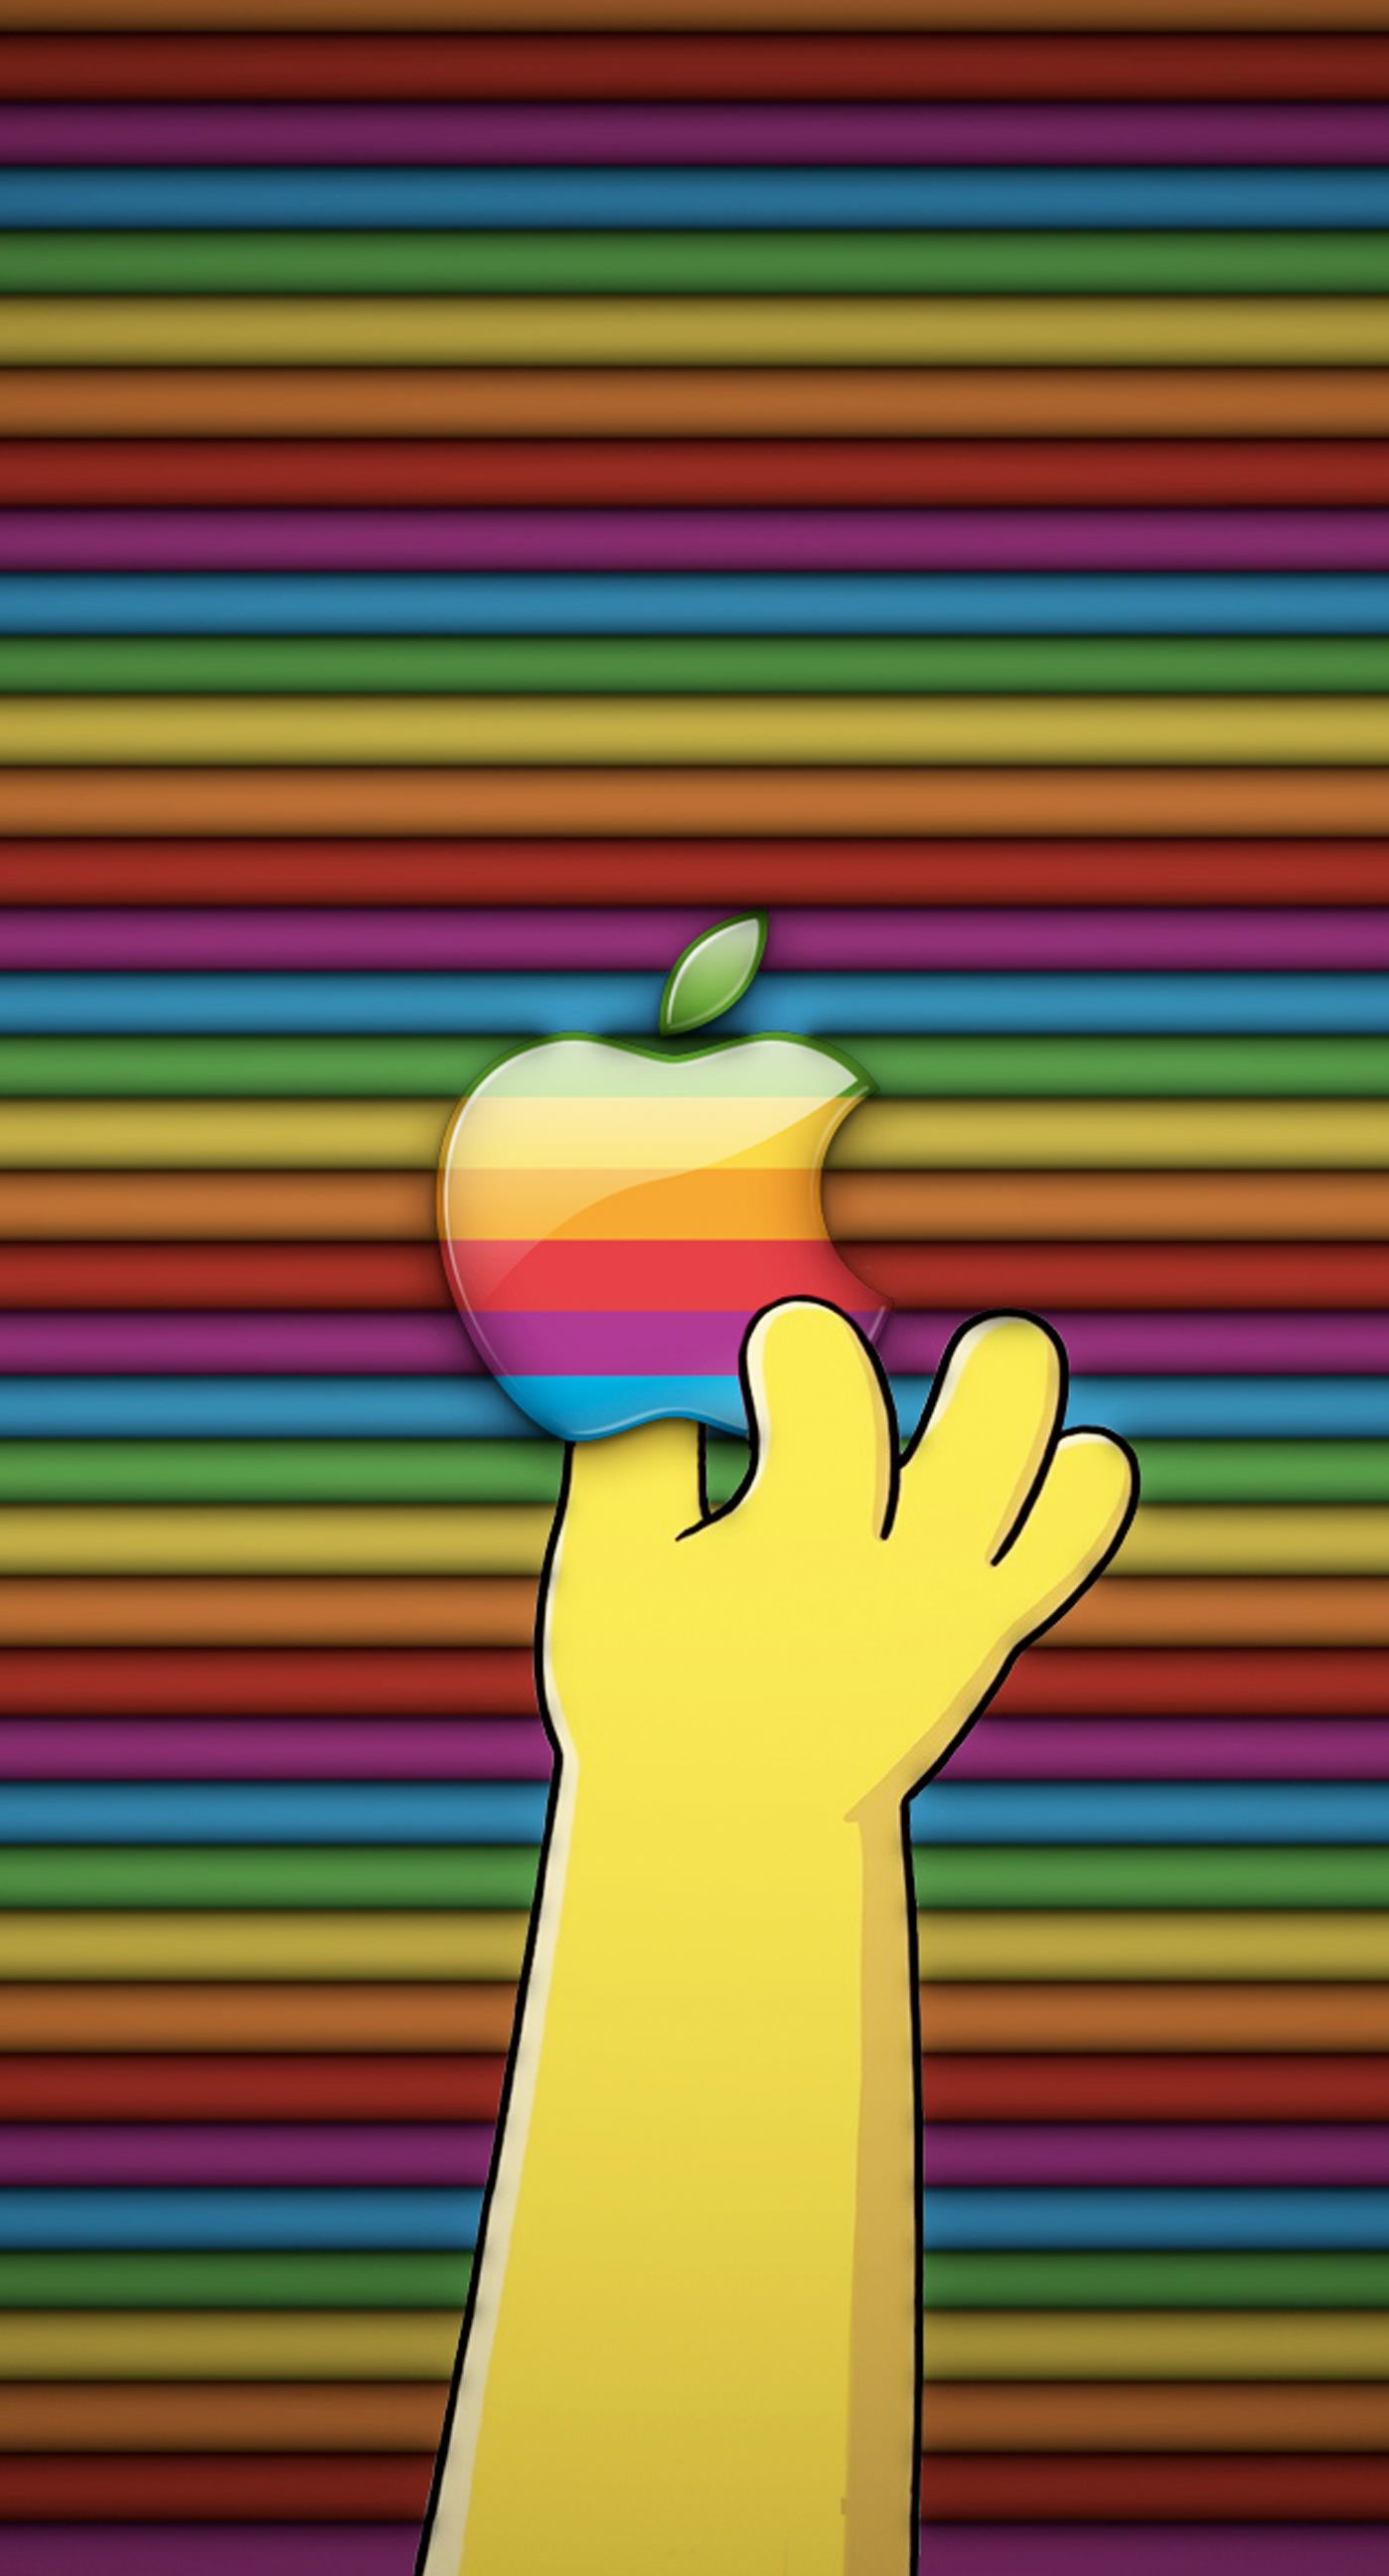 iPhone 6s Plus / iPhone 6 Plus 壁紙 Apple wallpaper iphone